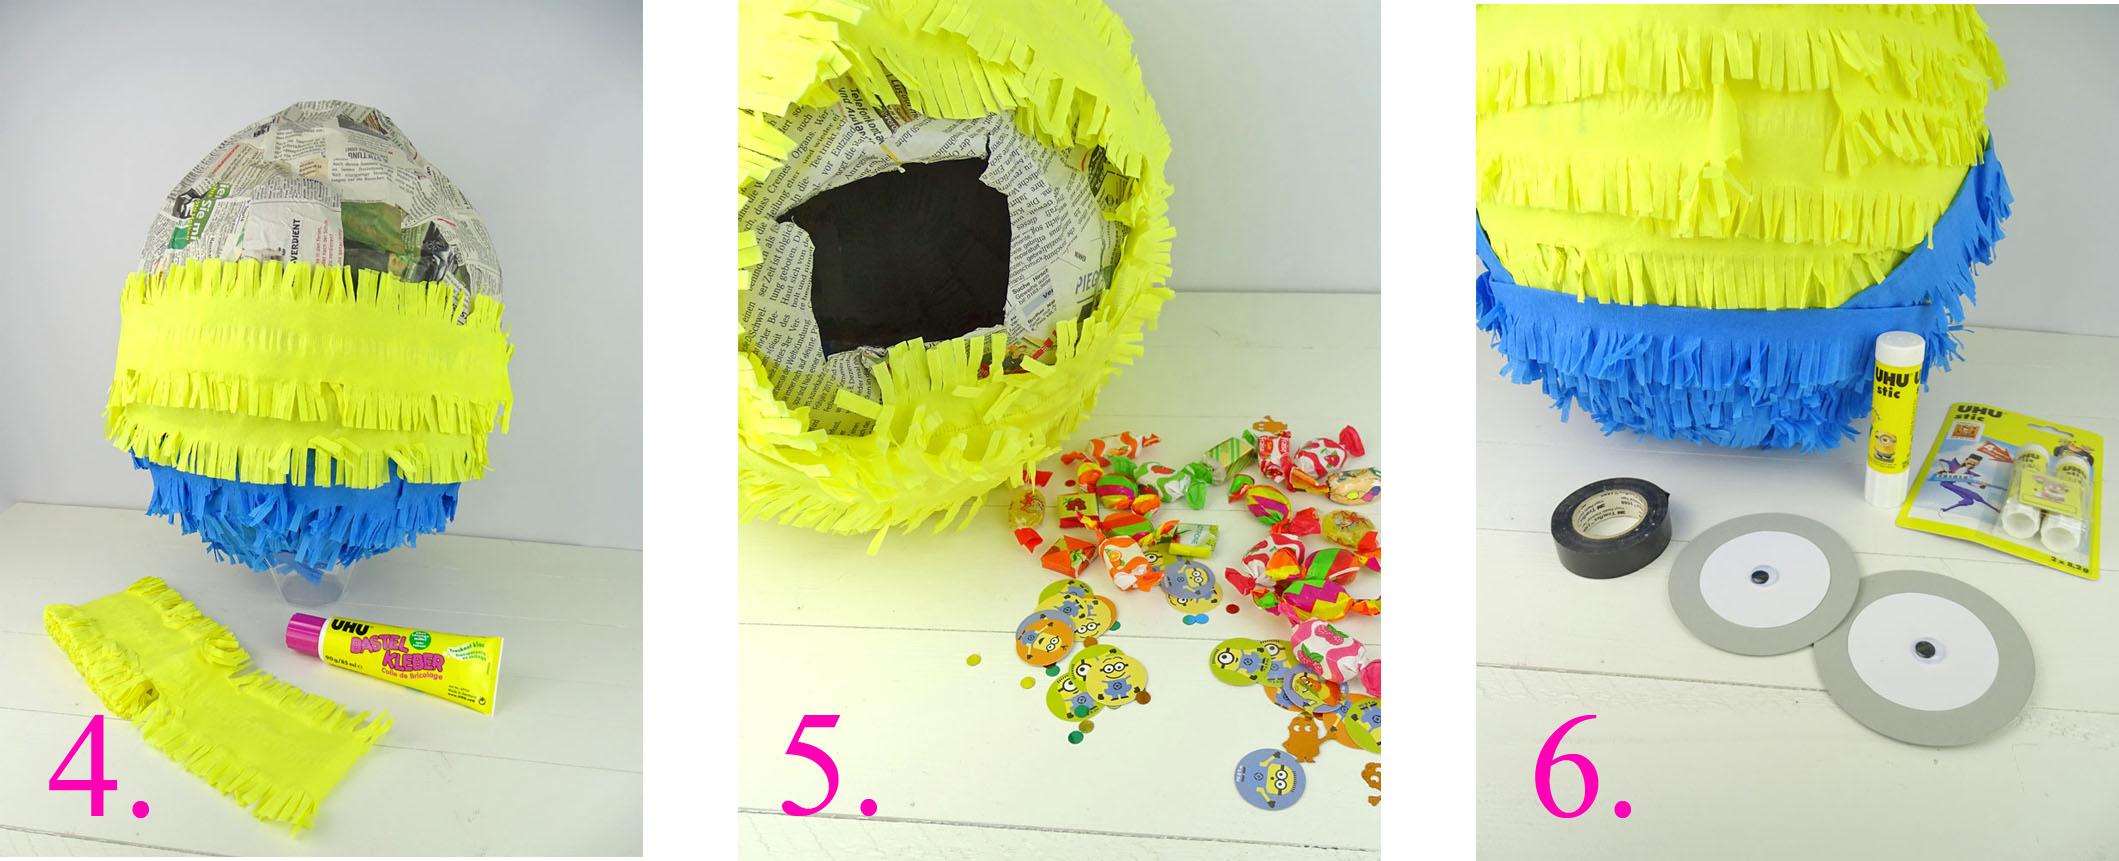 Minion Pinata basteln - Anleitung 4 bis 6